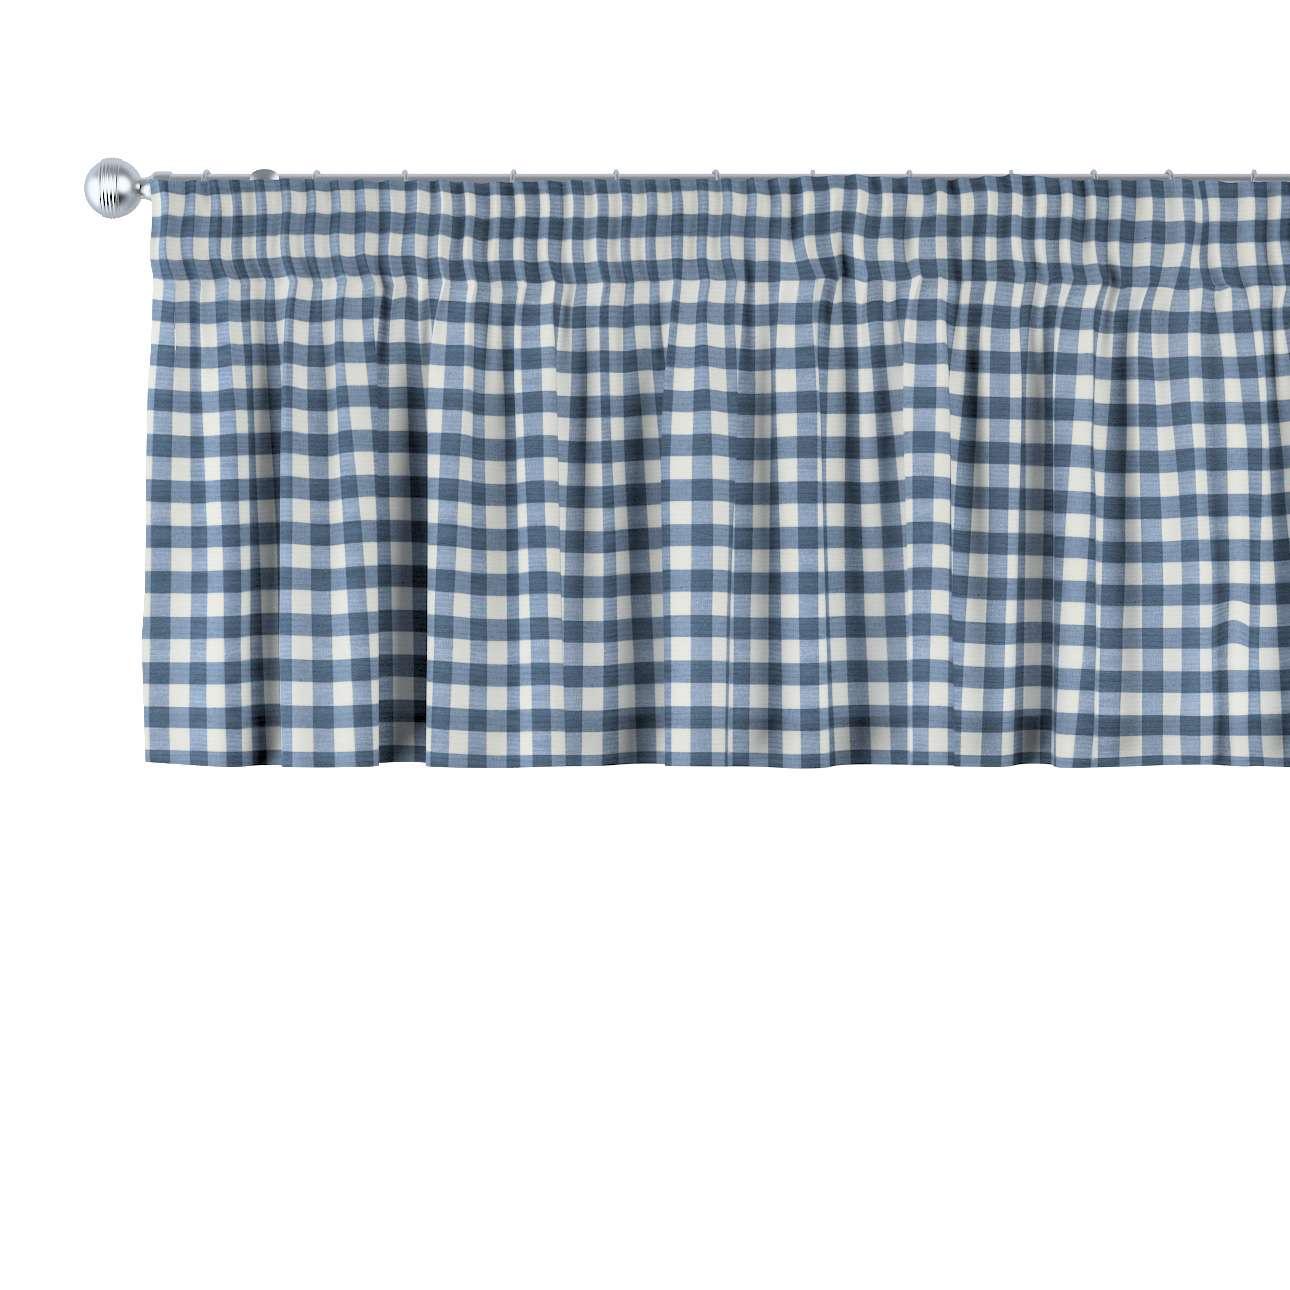 Kurzgardine mit Kräuselband 130 x 40 cm von der Kollektion Quadro, Stoff: 136-01